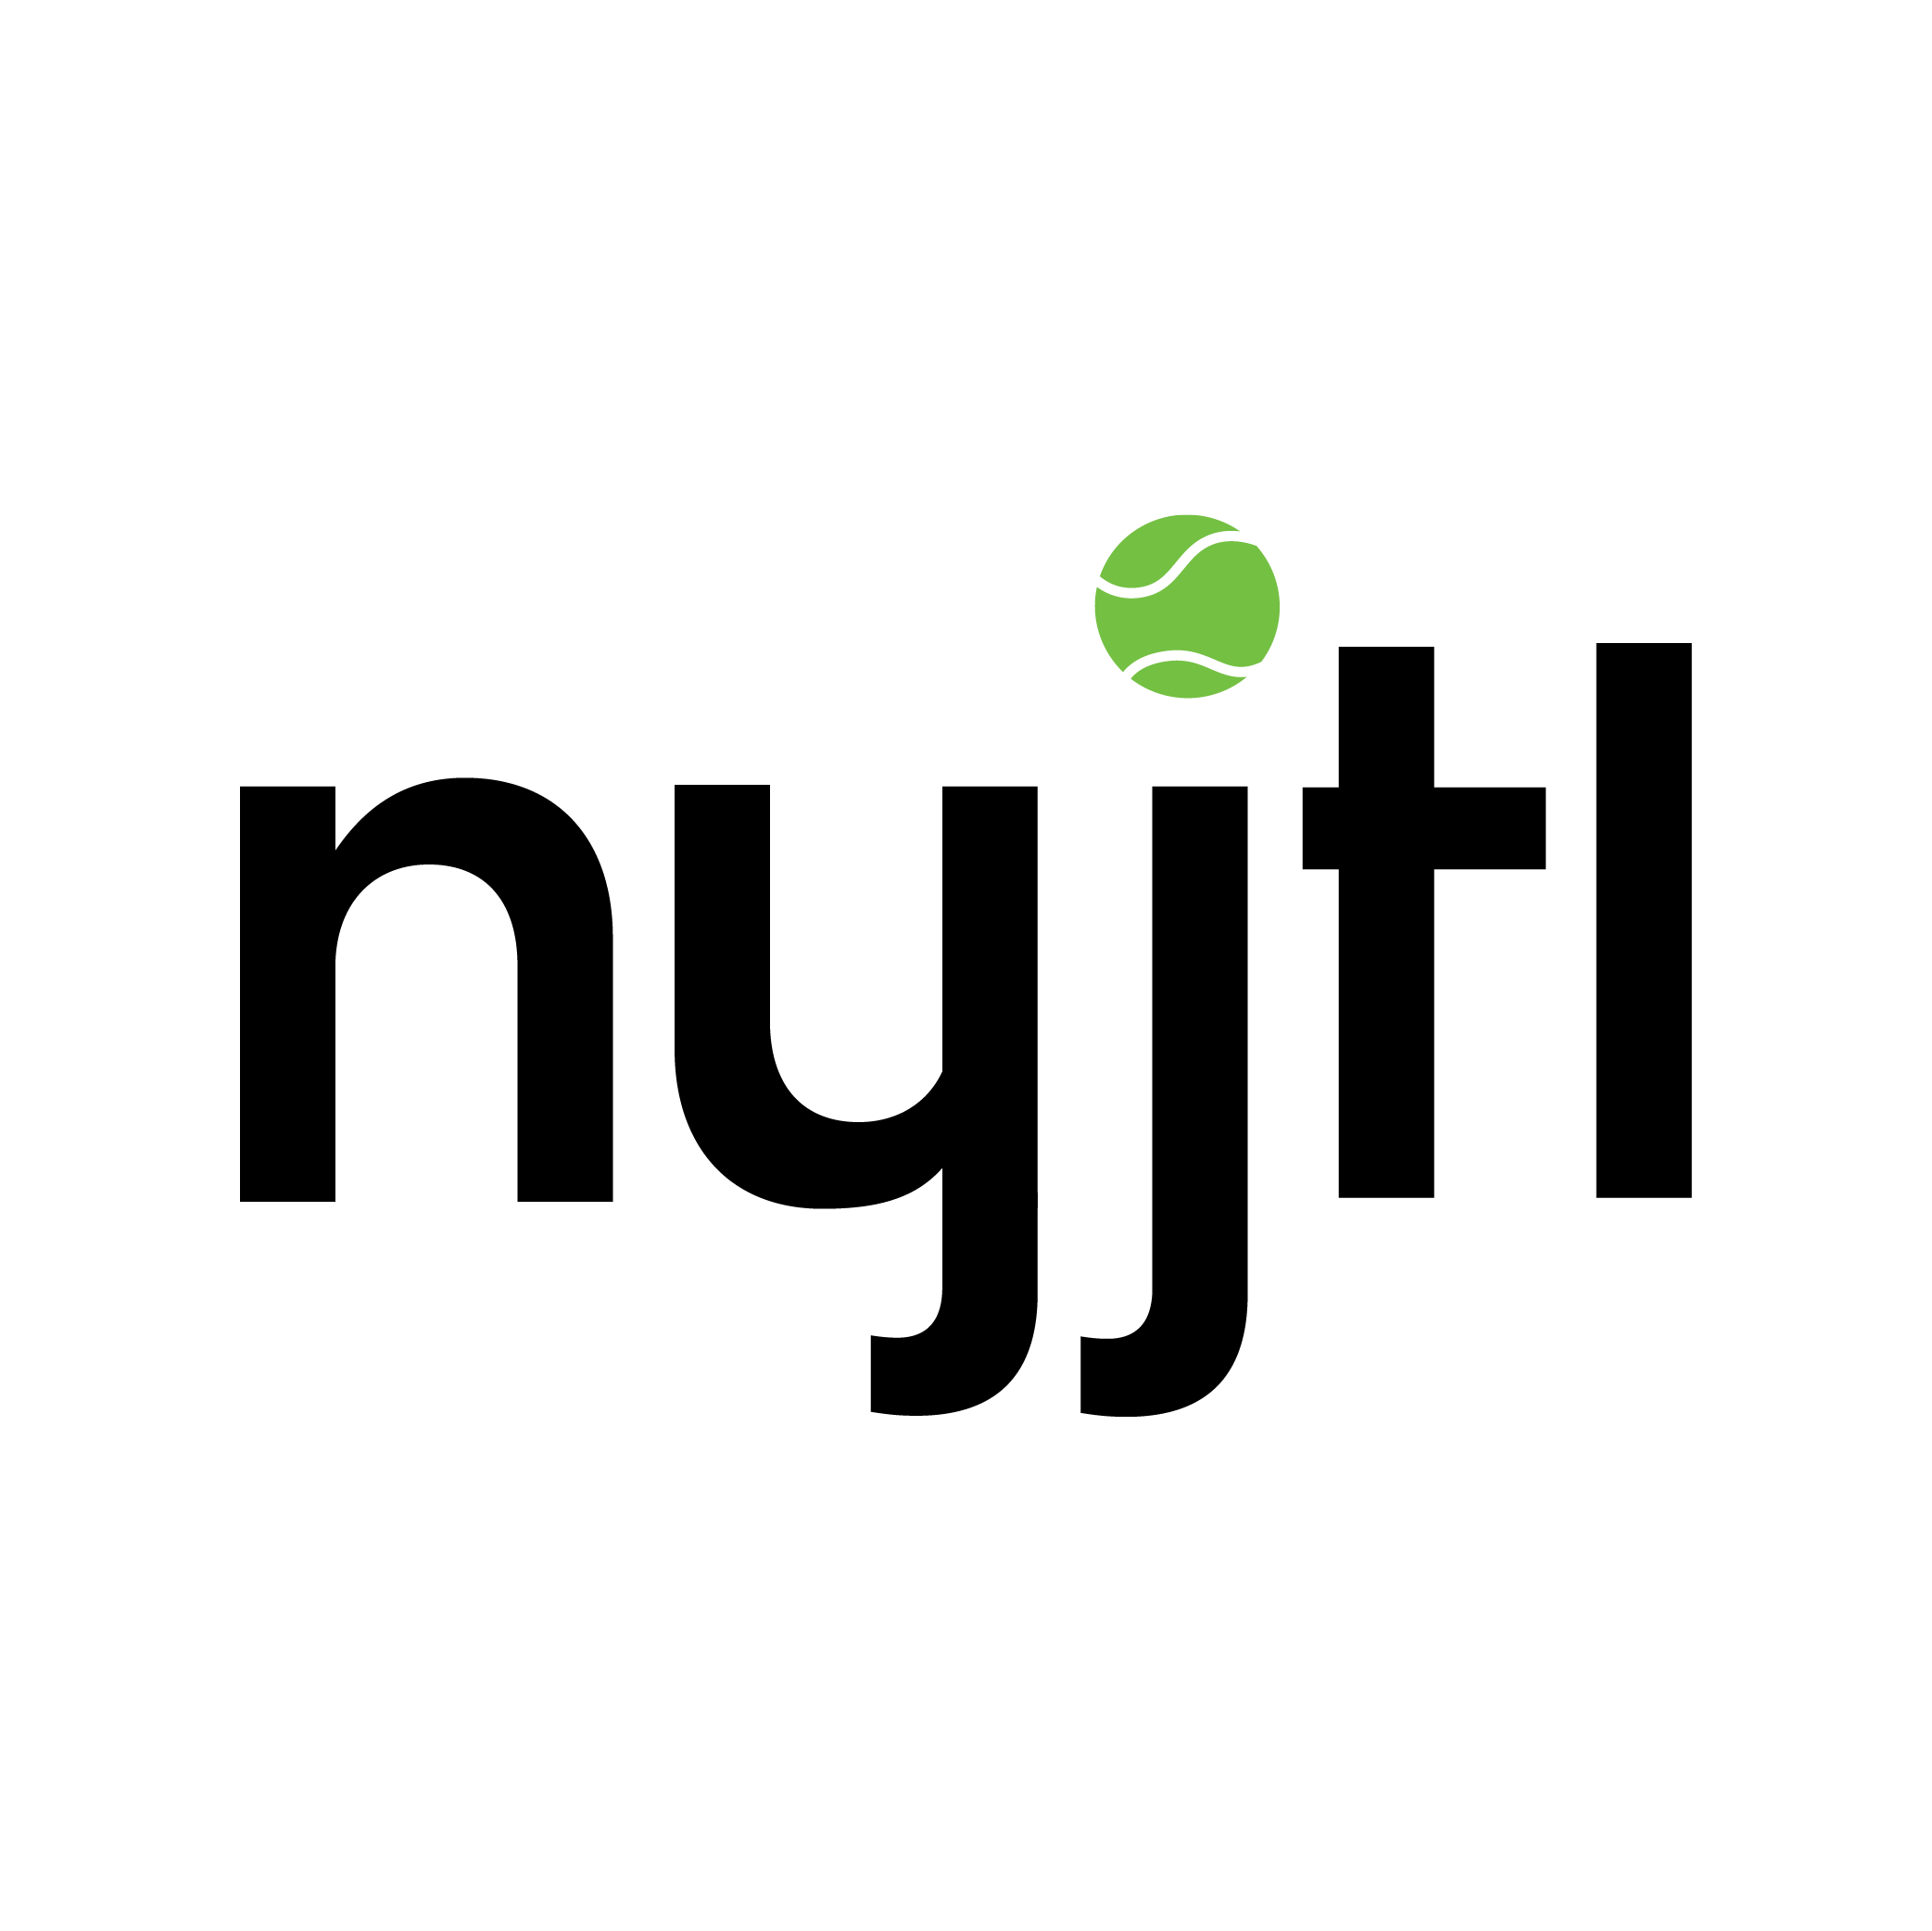 Logos-Formatted-Master-15